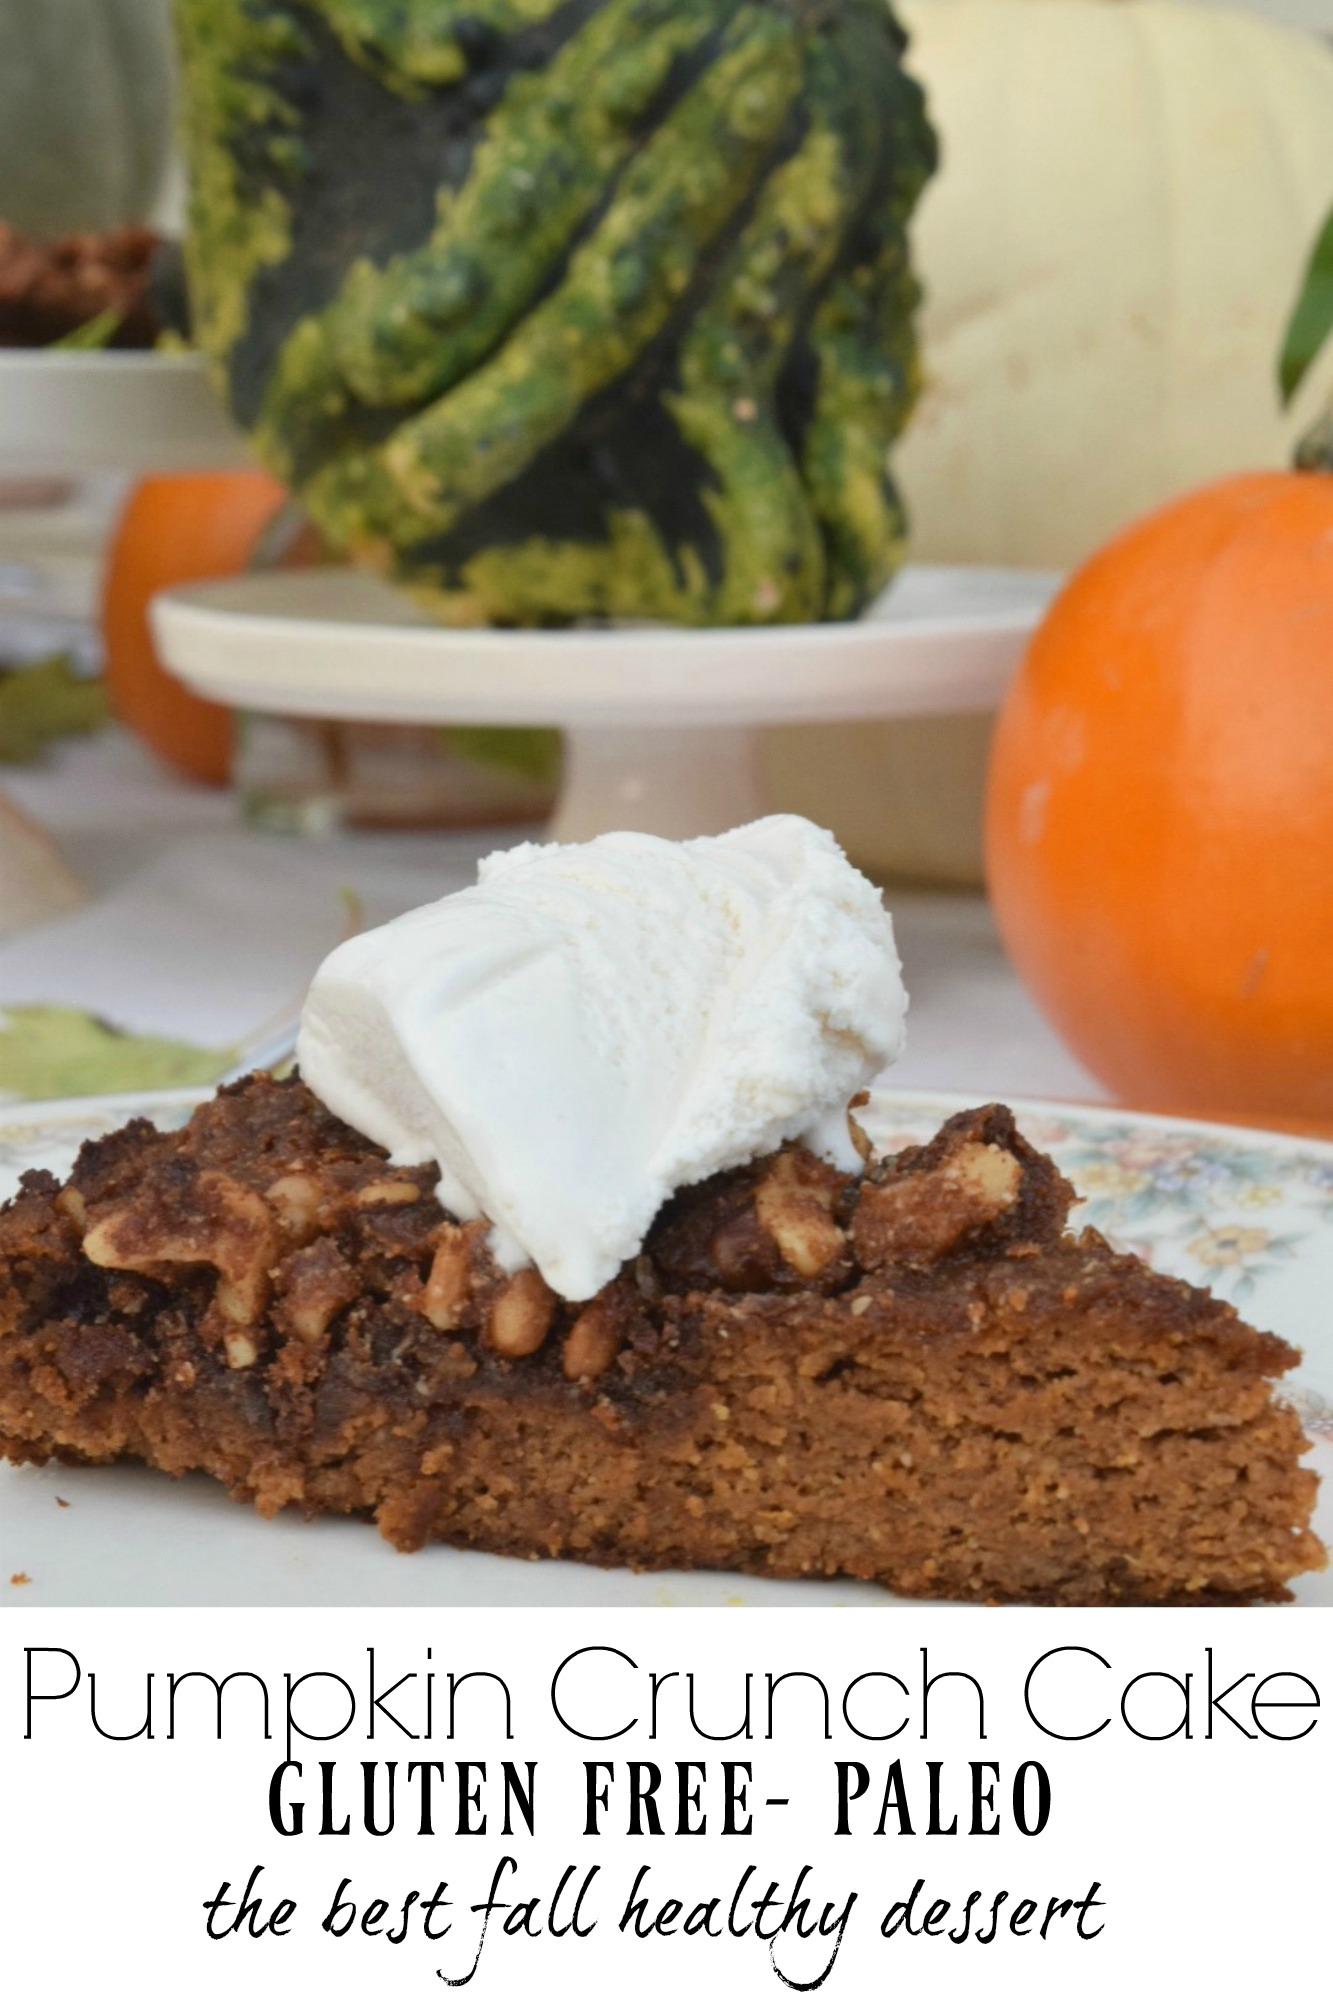 Paleo Pumpkin Crunch Cake- Paleo Desserts